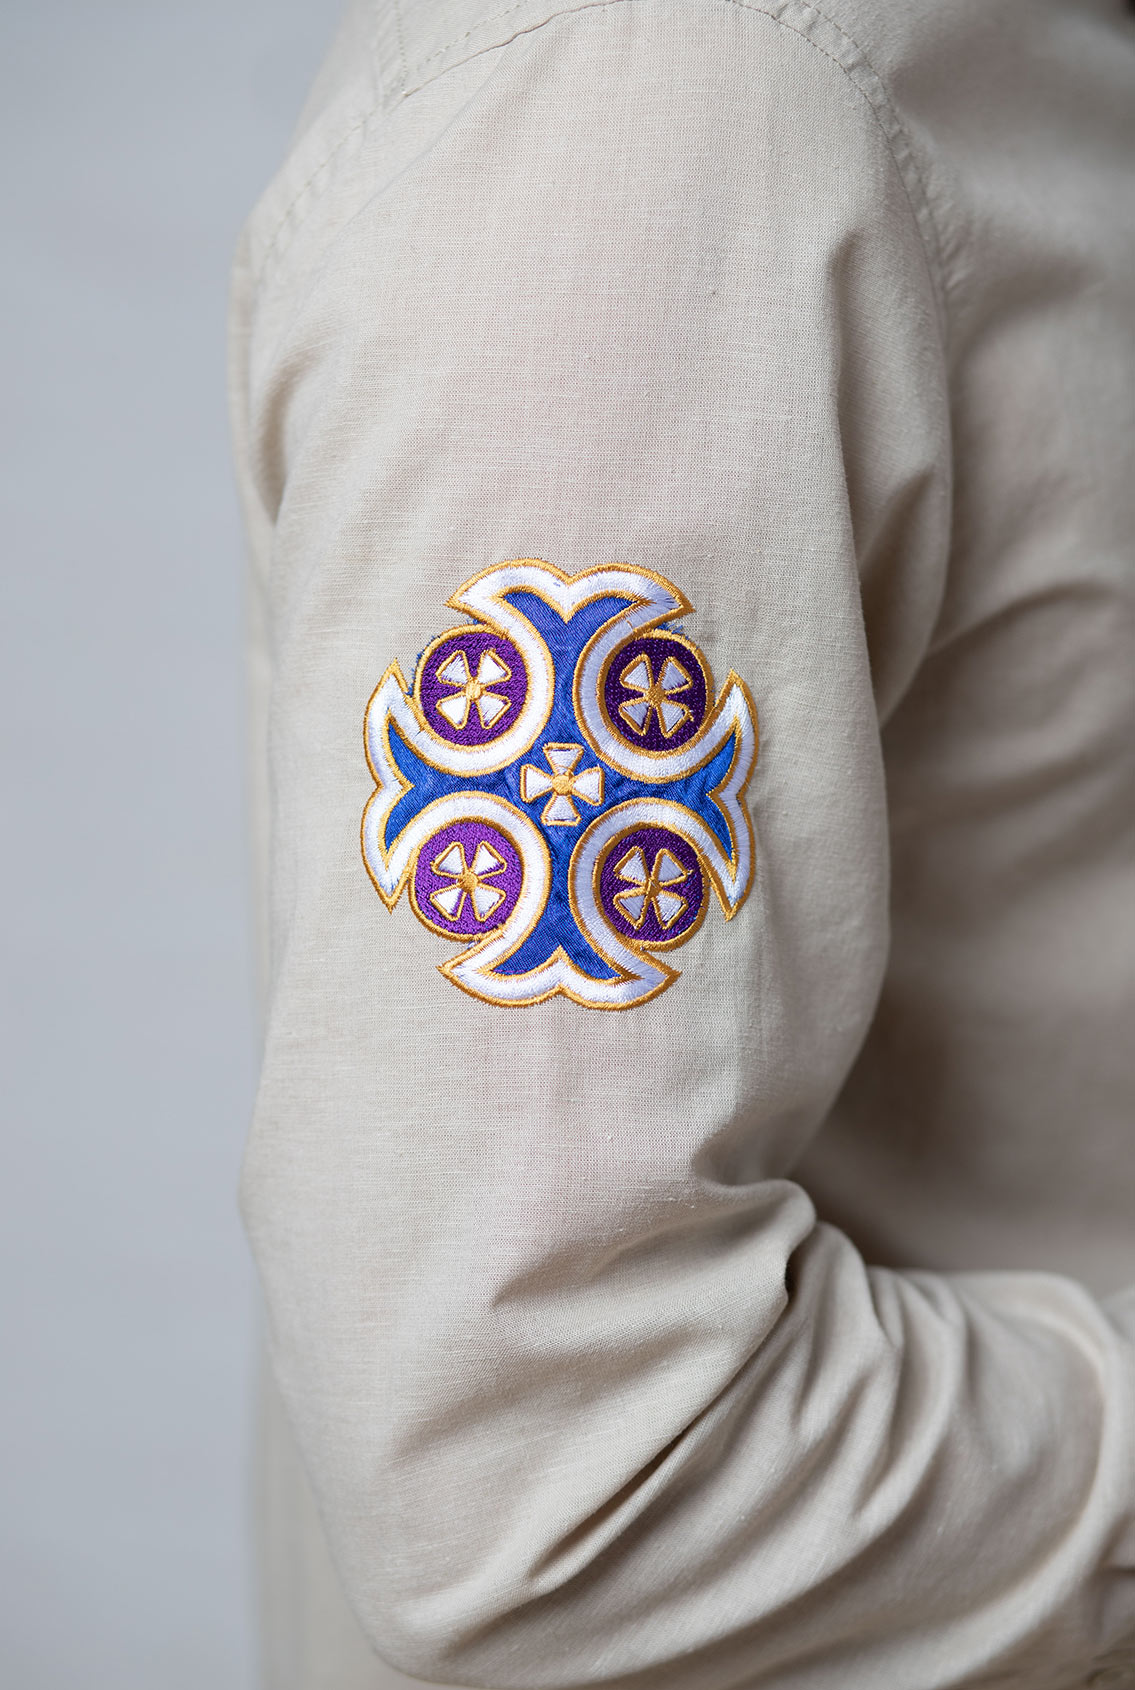 рубашка с крестом, shirt with a cross